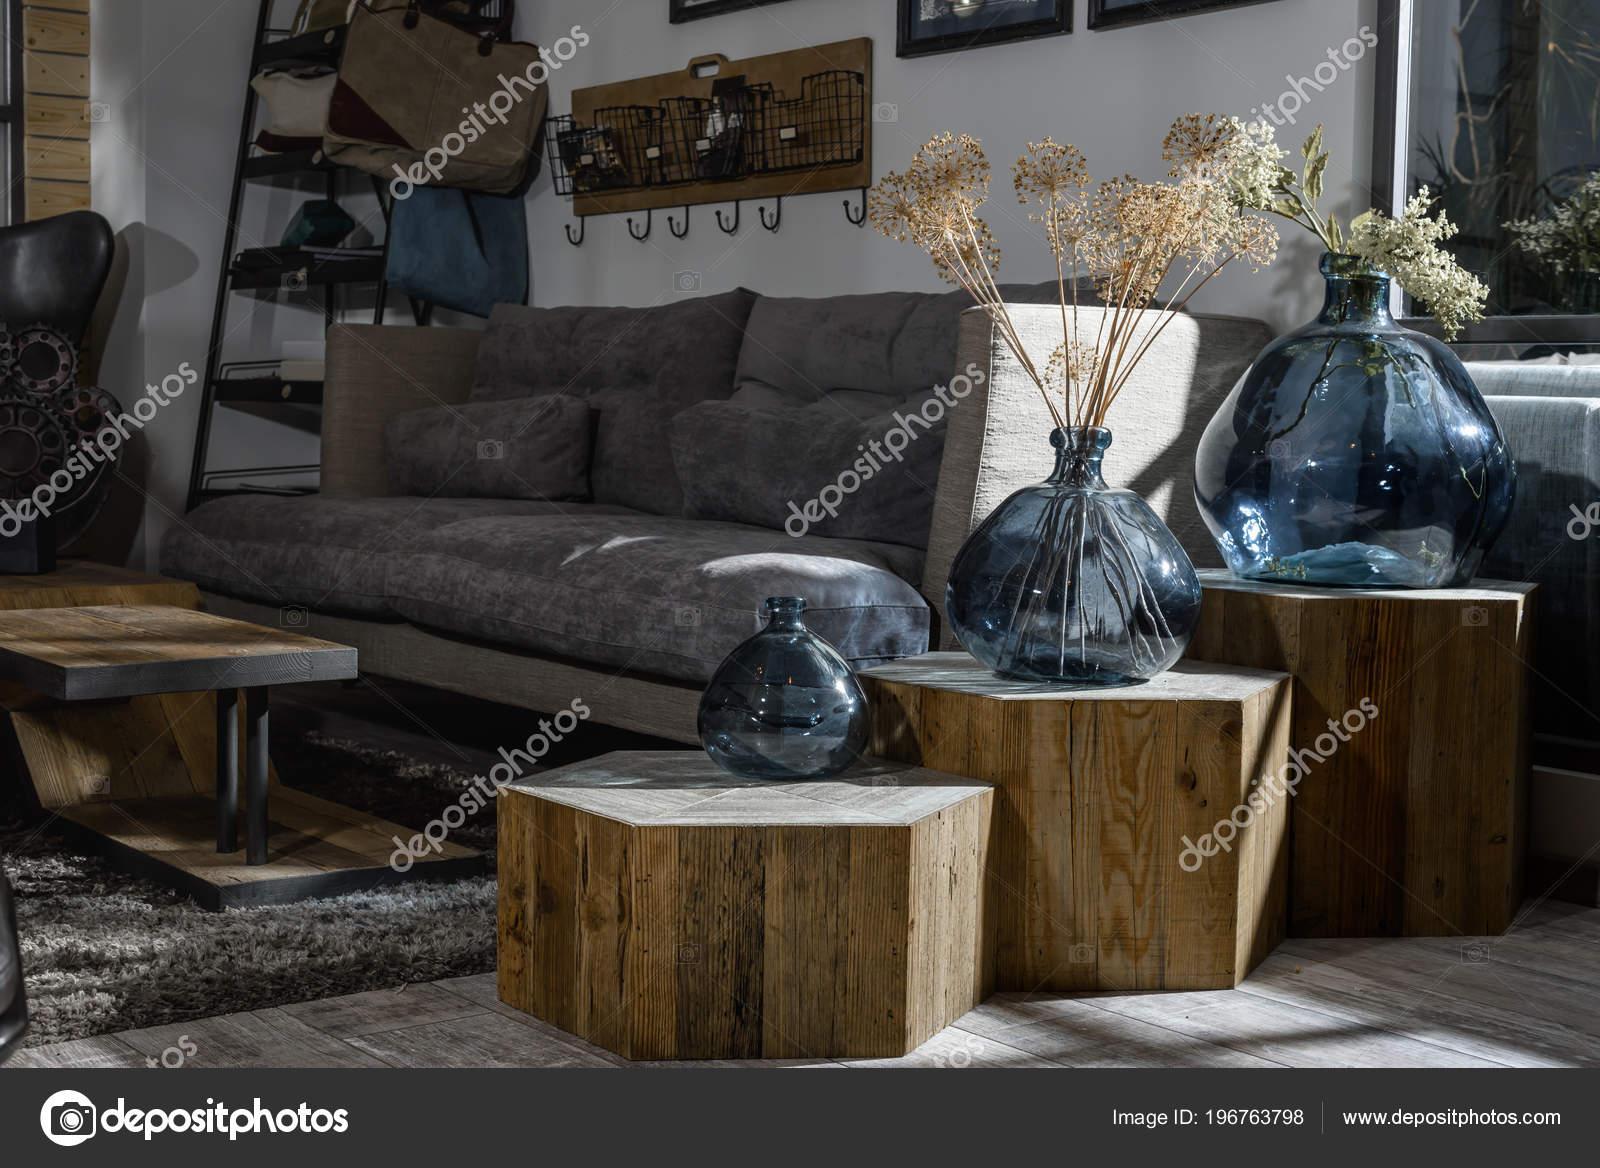 224fd1fc6d0f74 Interiores Retro Moderno Estilo Sala Estar Com Sofá Cinza Vasos ...